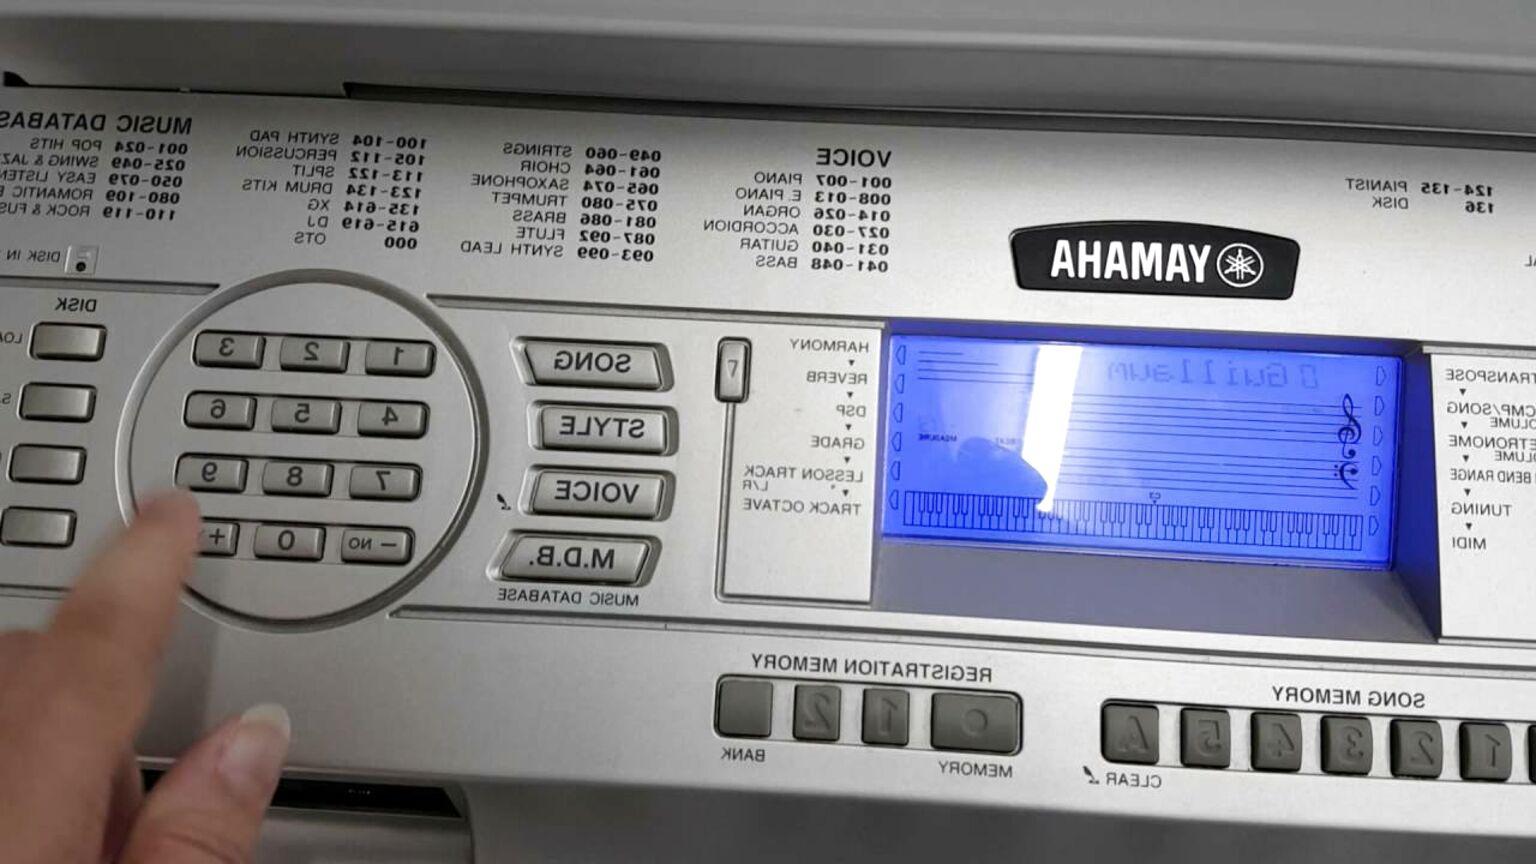 yamaha dgx 500 for sale